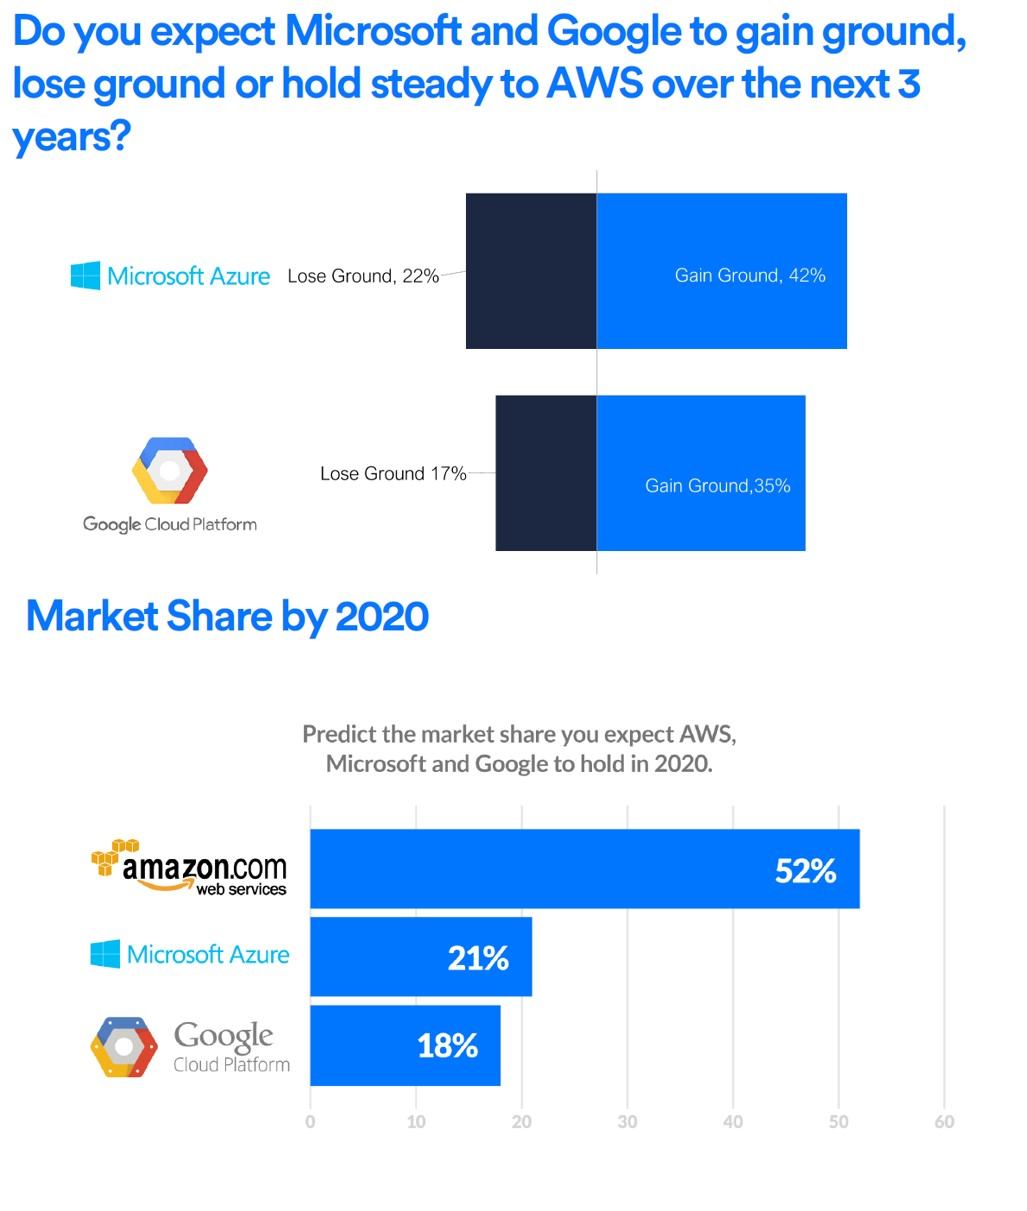 Amazon-AWS-Google-Cloud-Microsoft-Azure-Market-Share-estimates.jpg